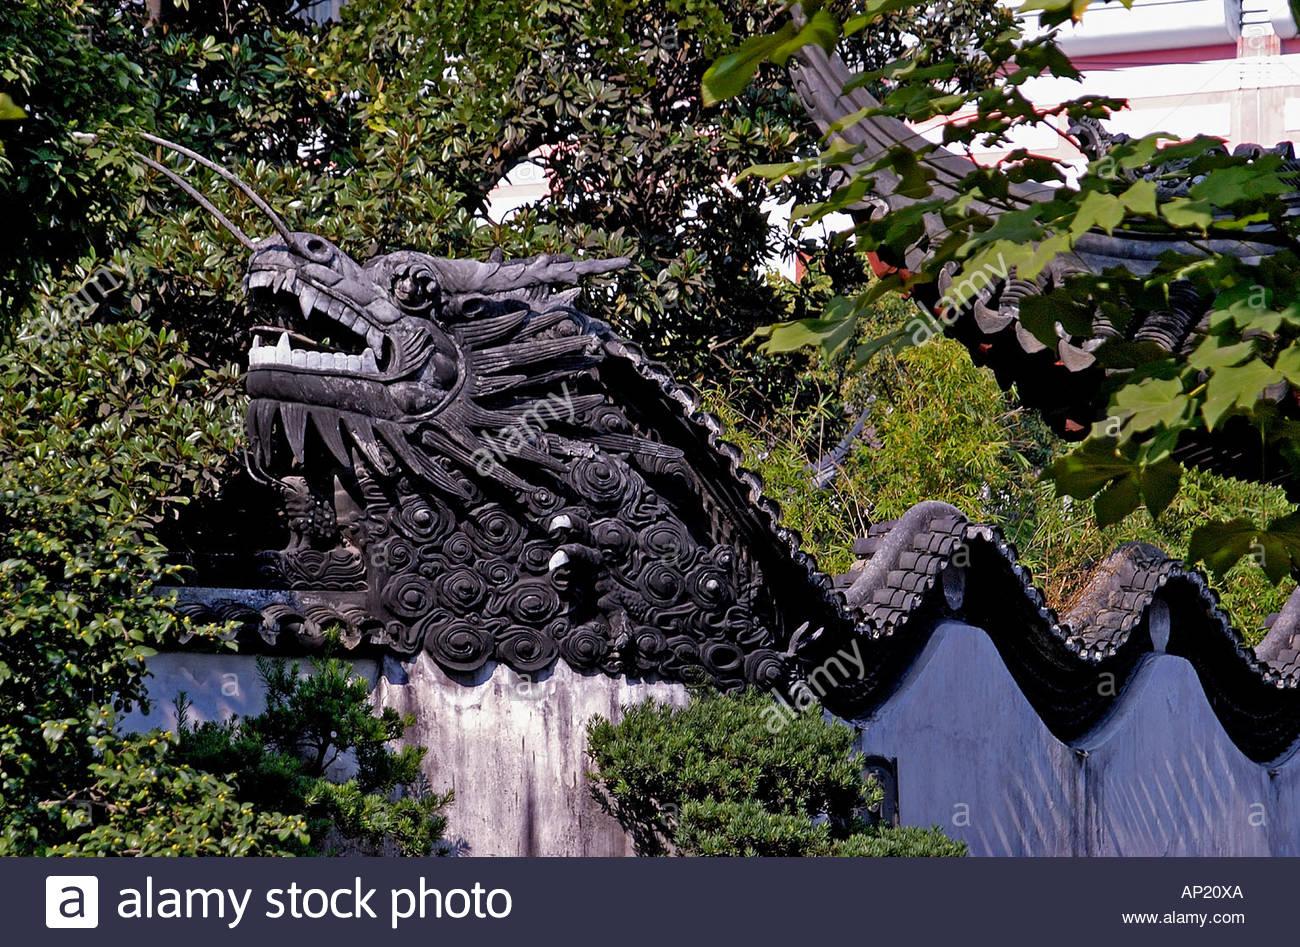 Dragon Wall Decoration - Stock Image